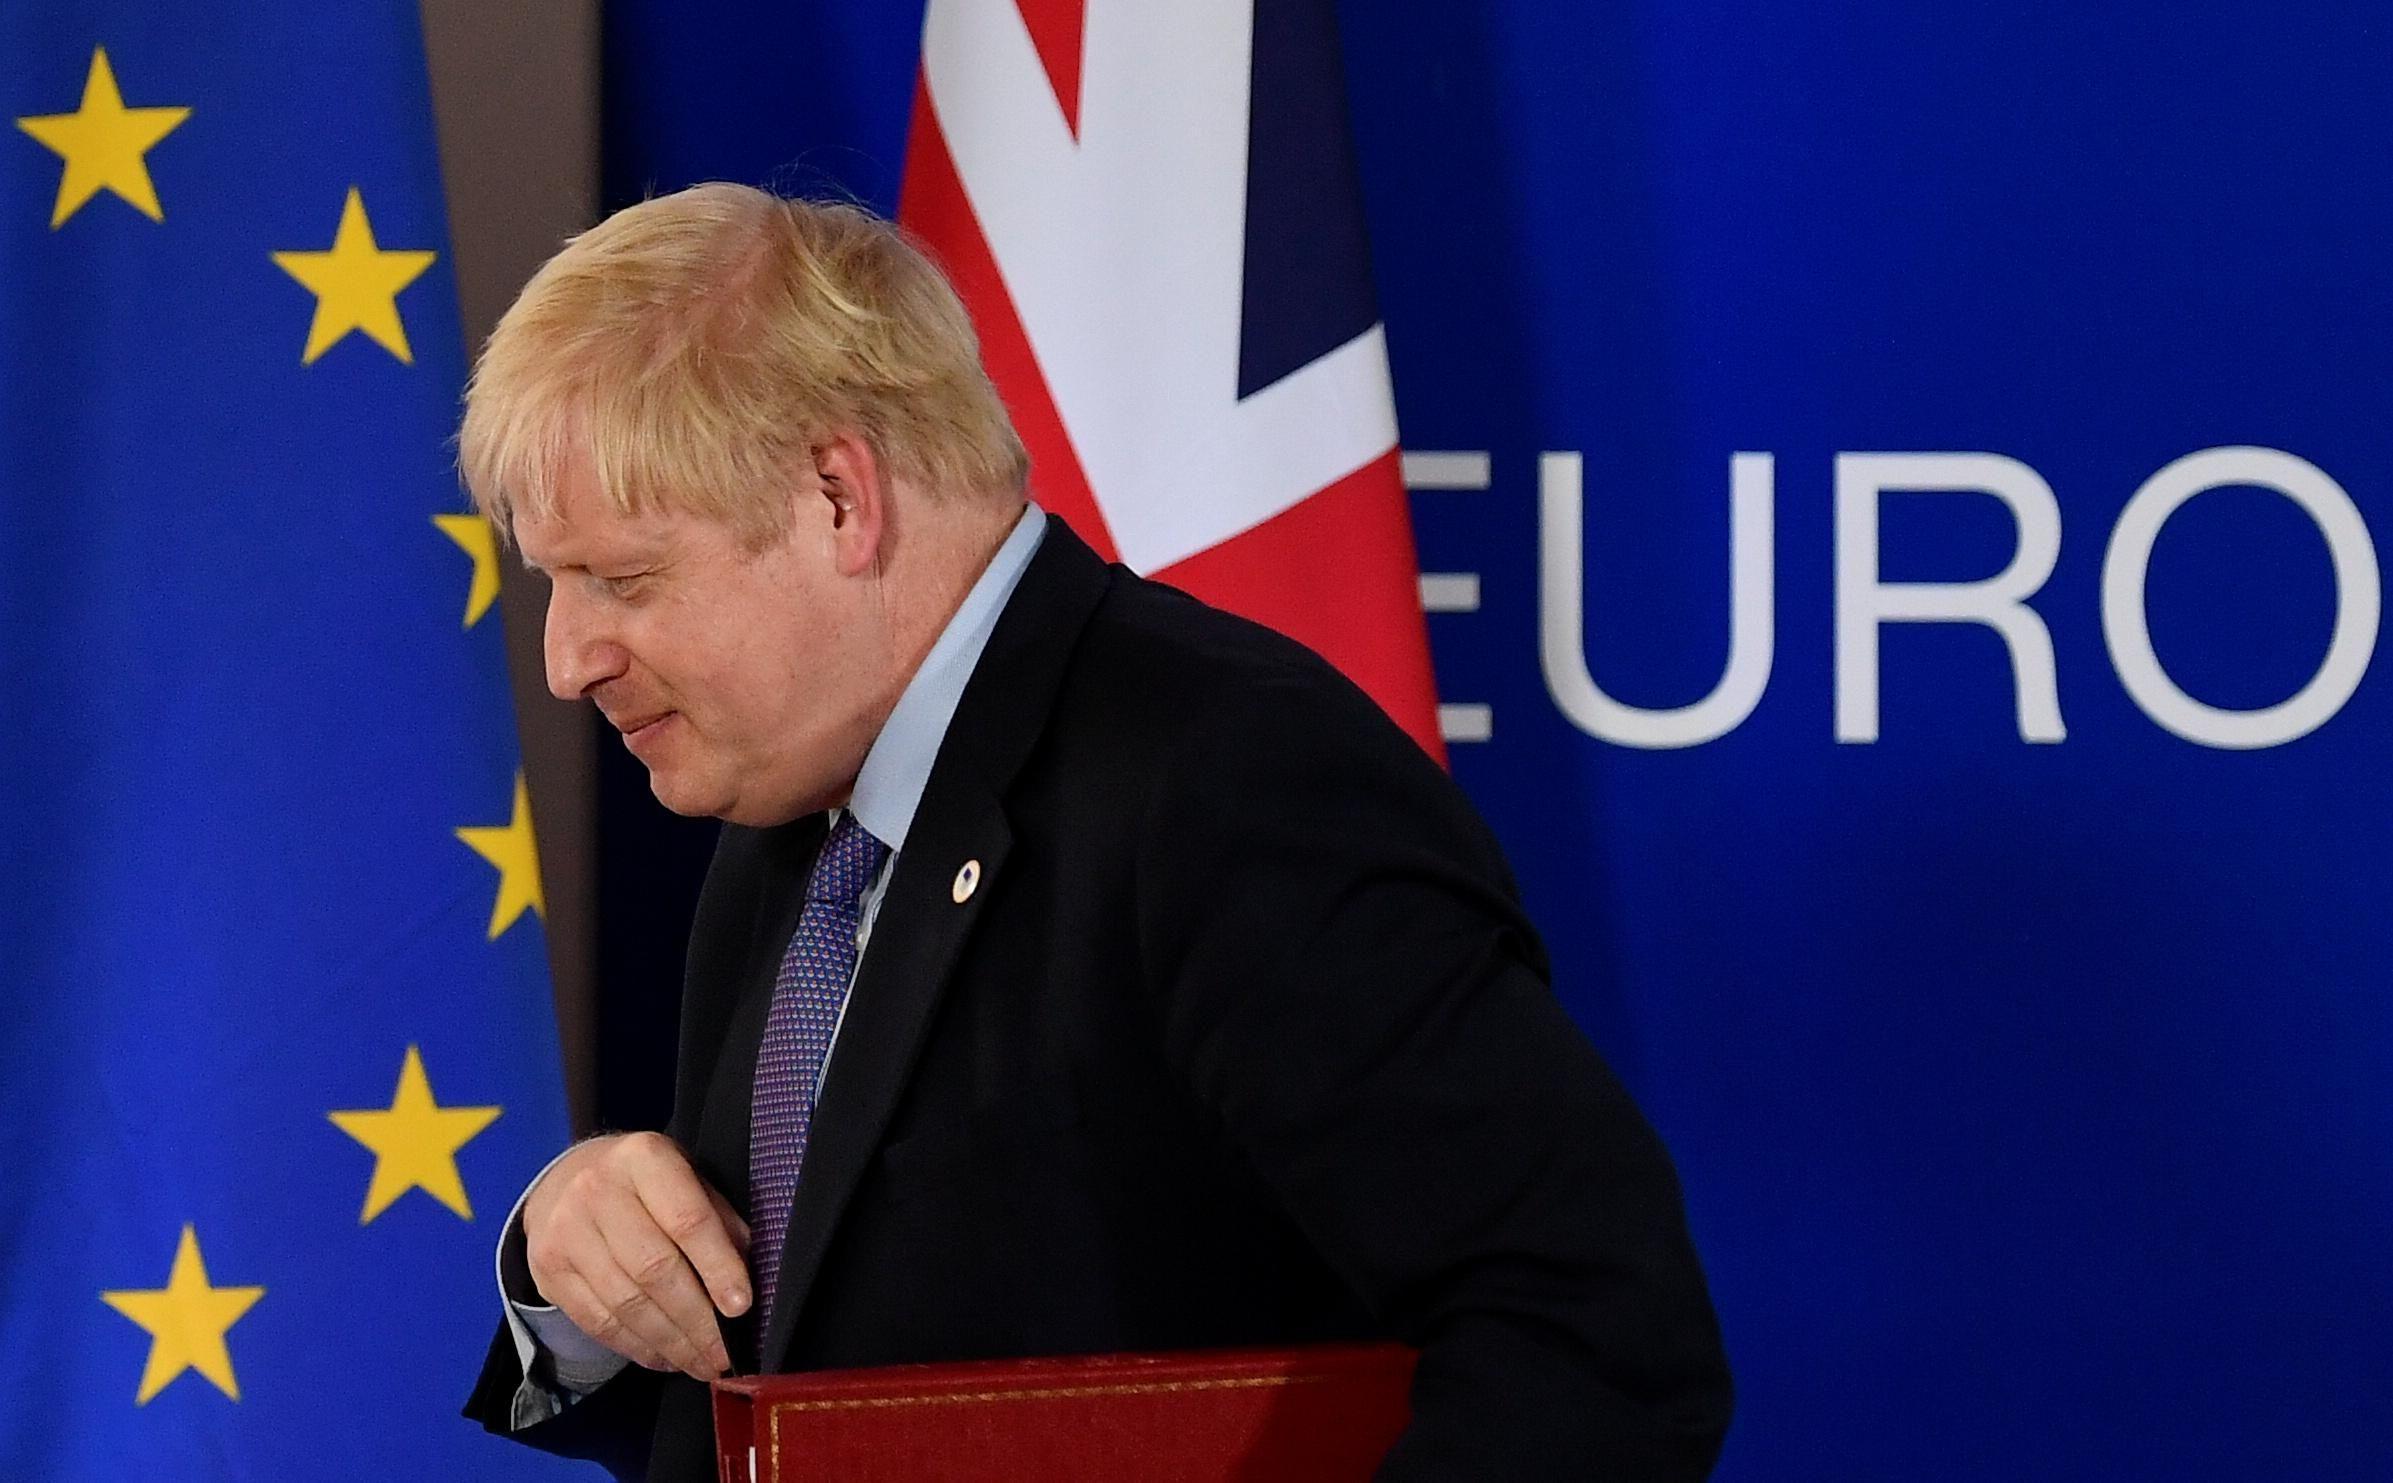 British PM Boris Johnson at an EU Summit in Brussels. Reuters